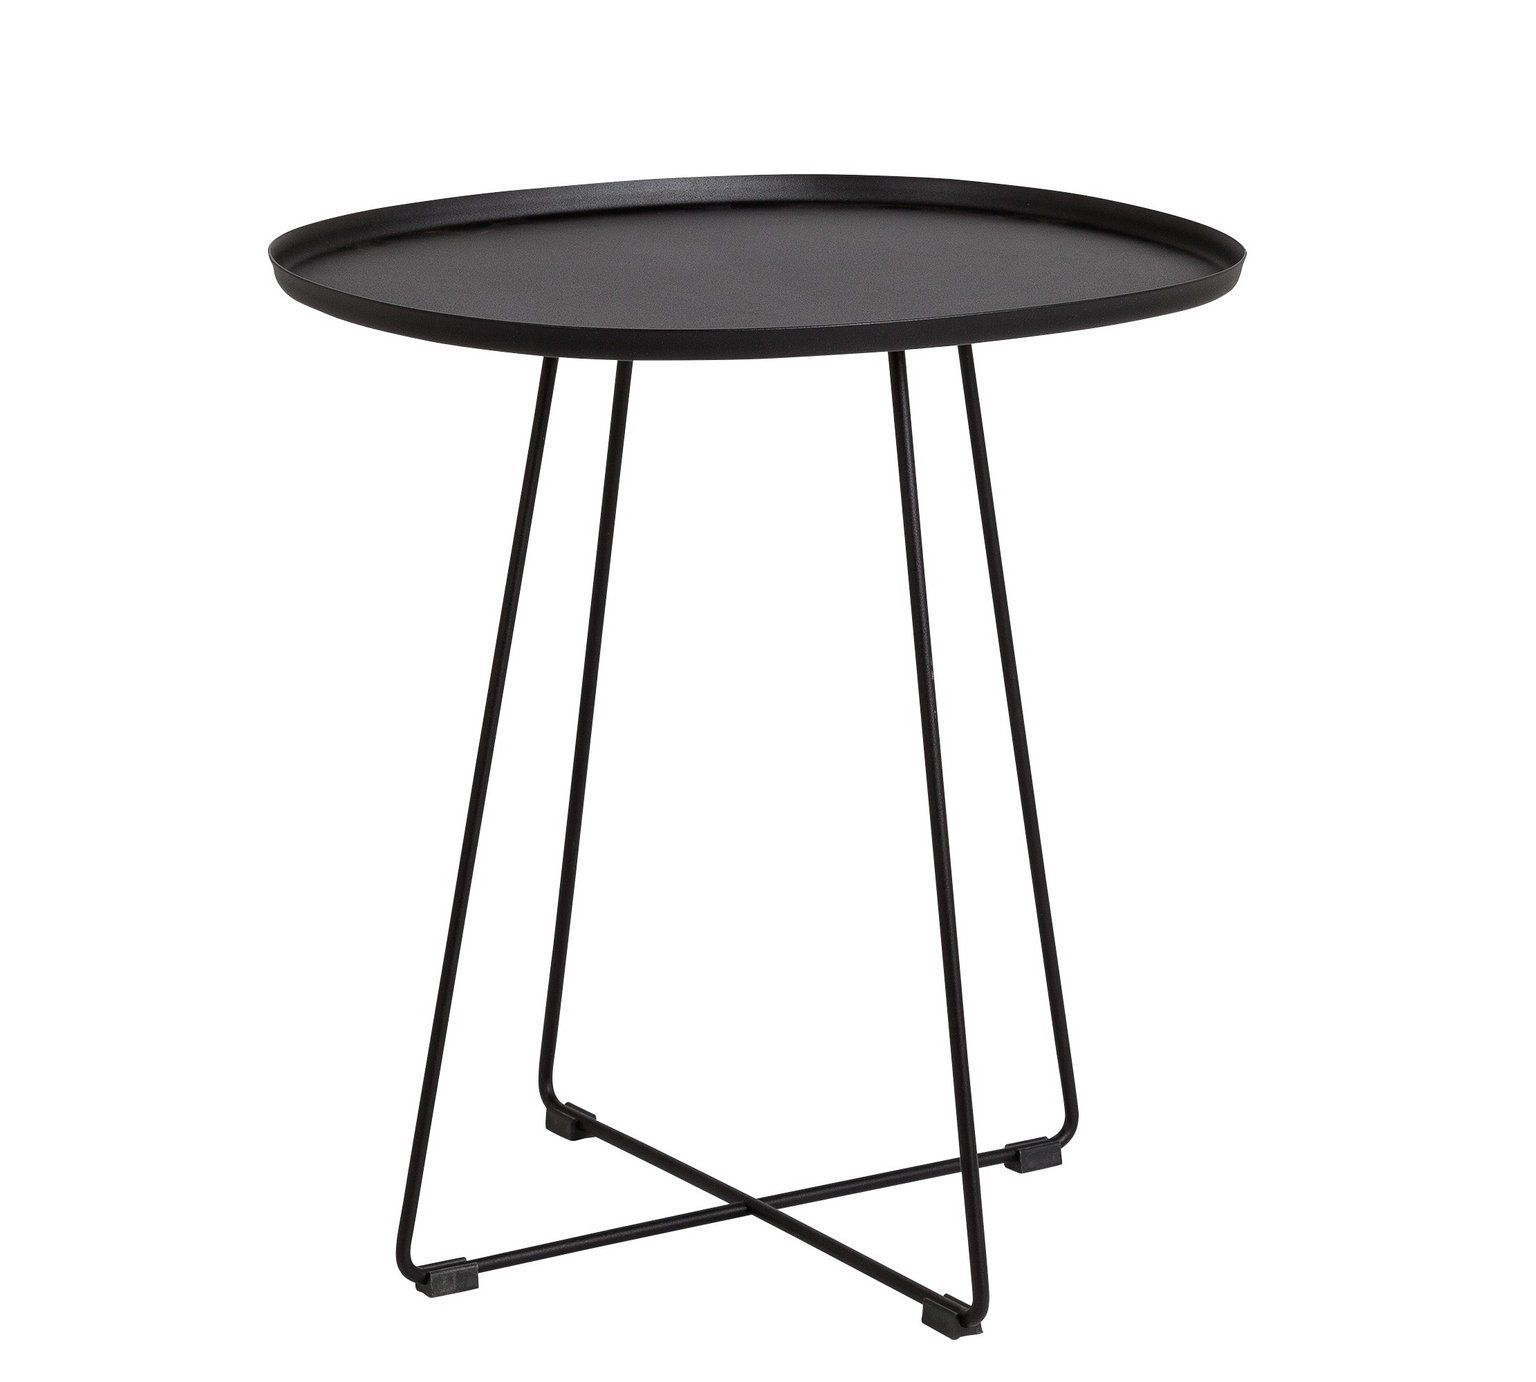 Buy Hygena Makwa Side Table Black At Argos Co Uk Your Online